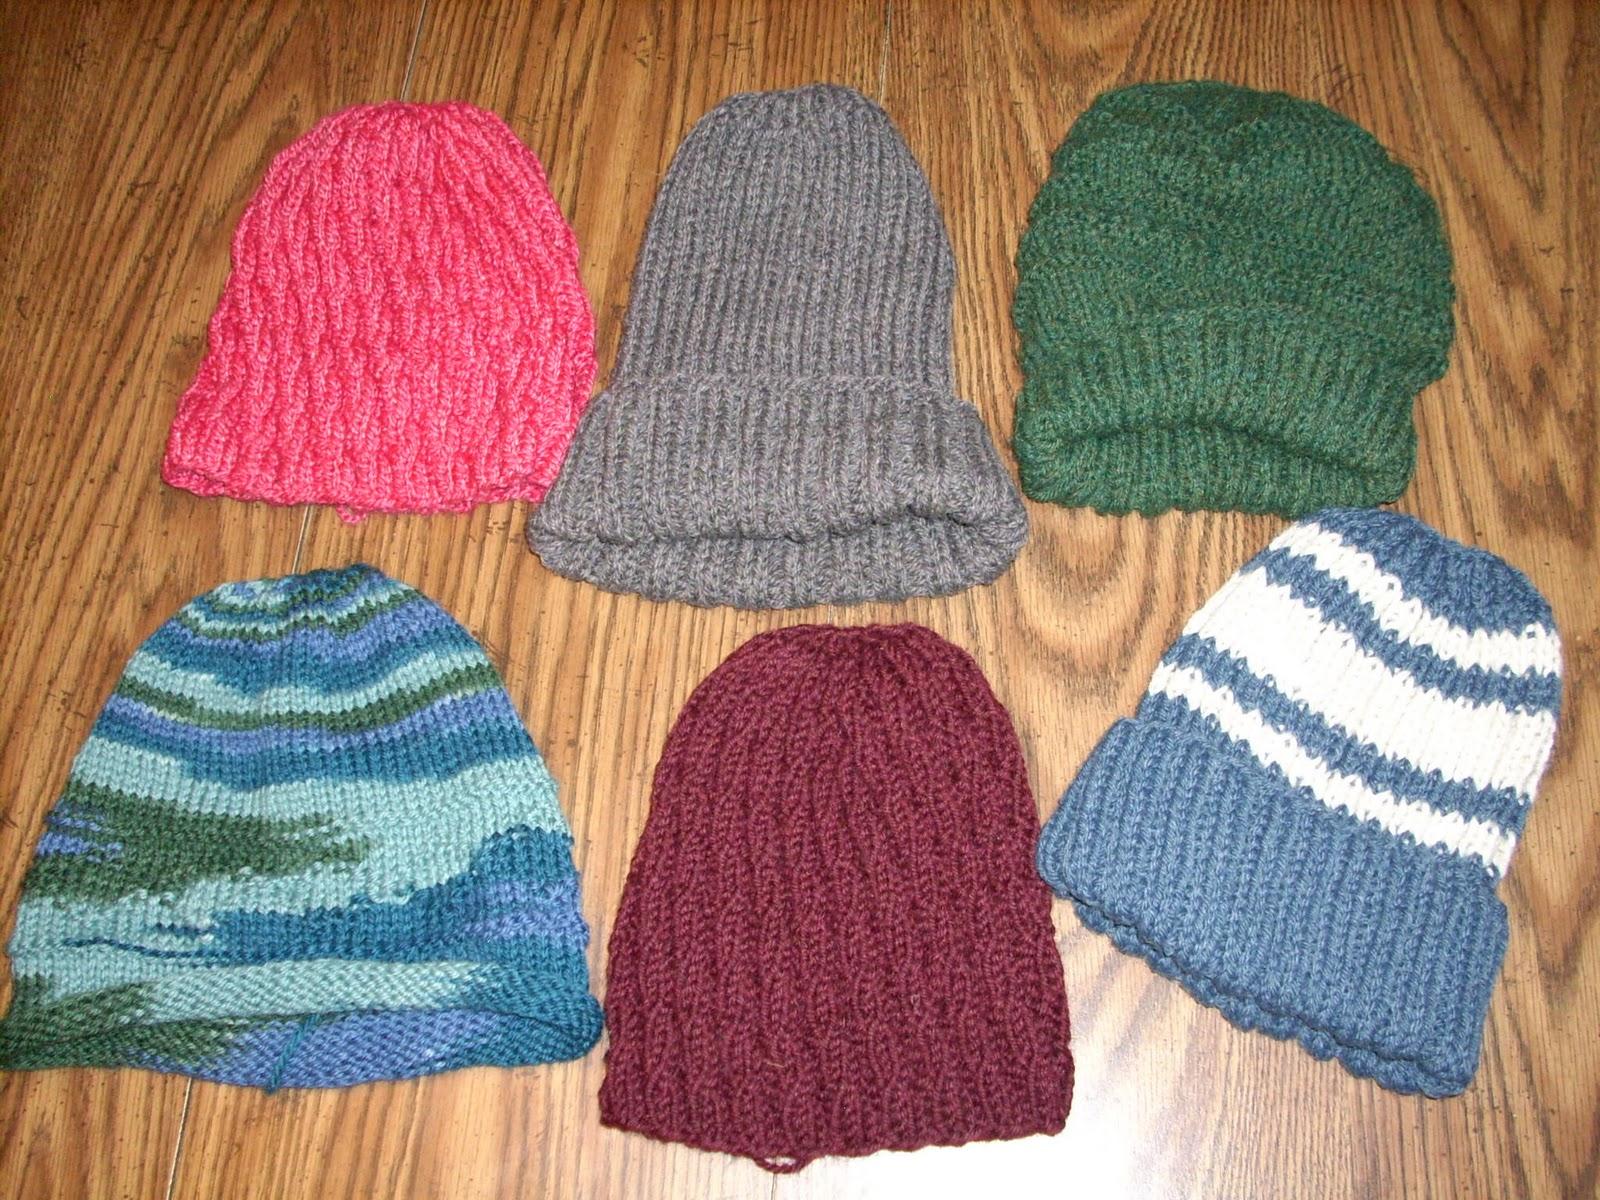 Innovation Knitting Machine Patterns : Complusive yarn aholic